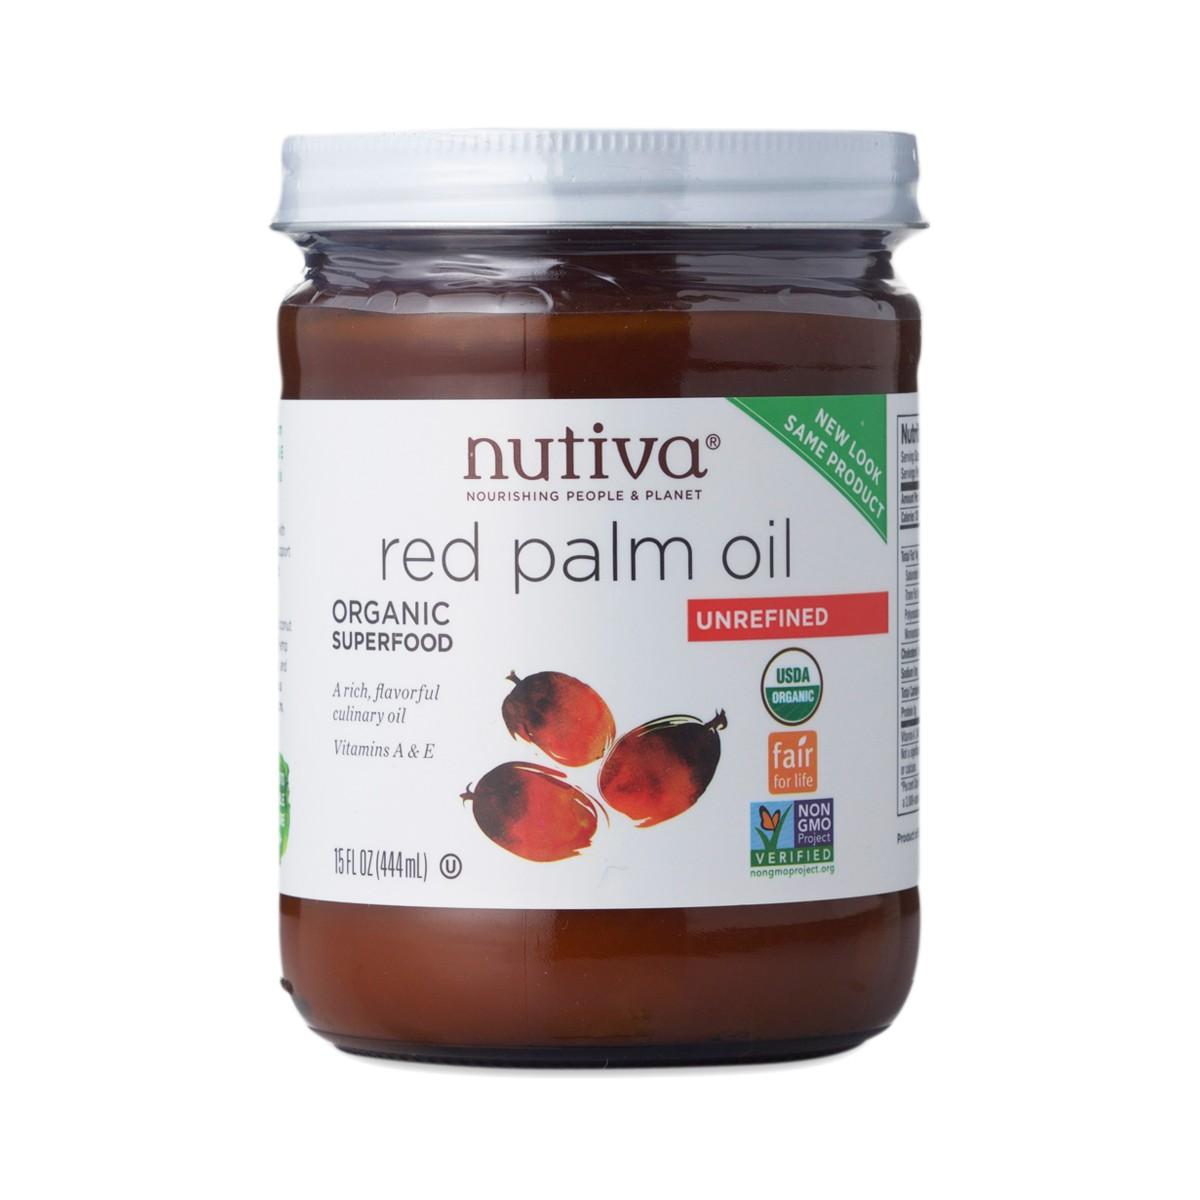 Red palm oil organic